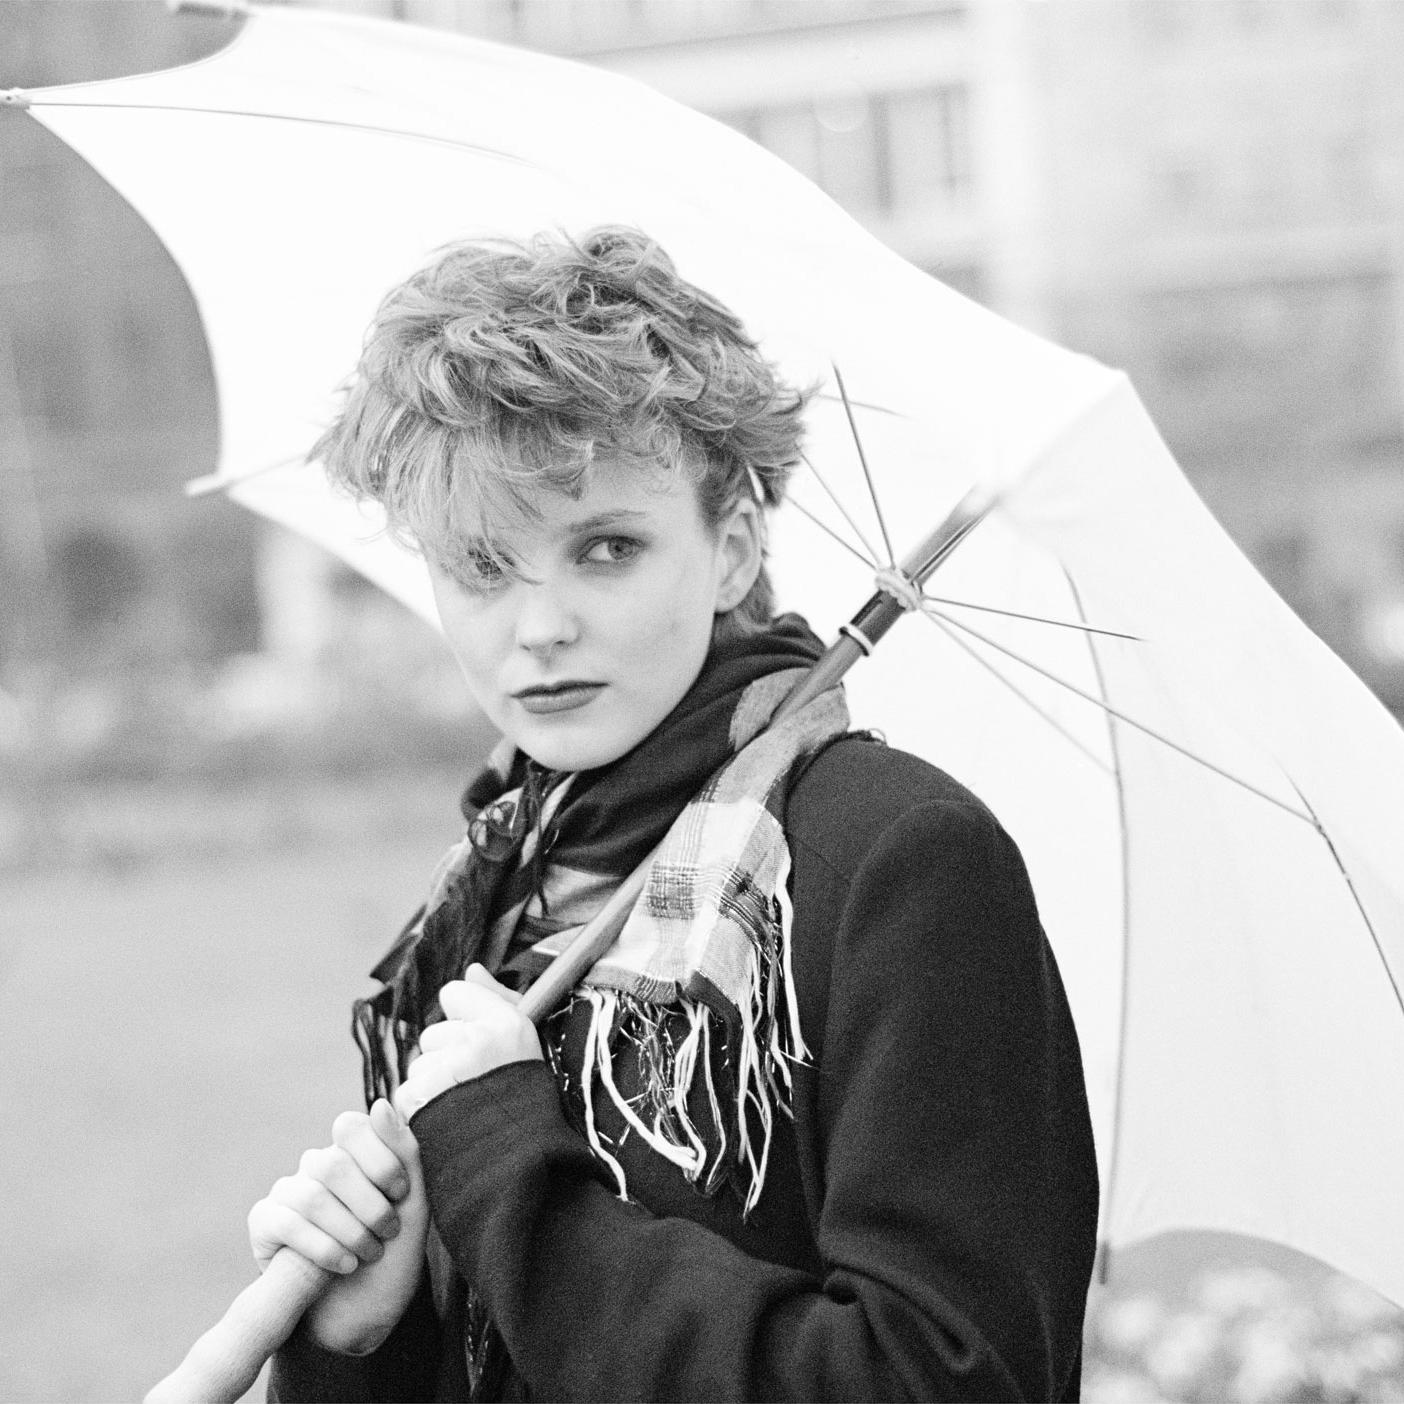 Image of Claire Grogan (with Umbrella) by Harry Papadopoulos